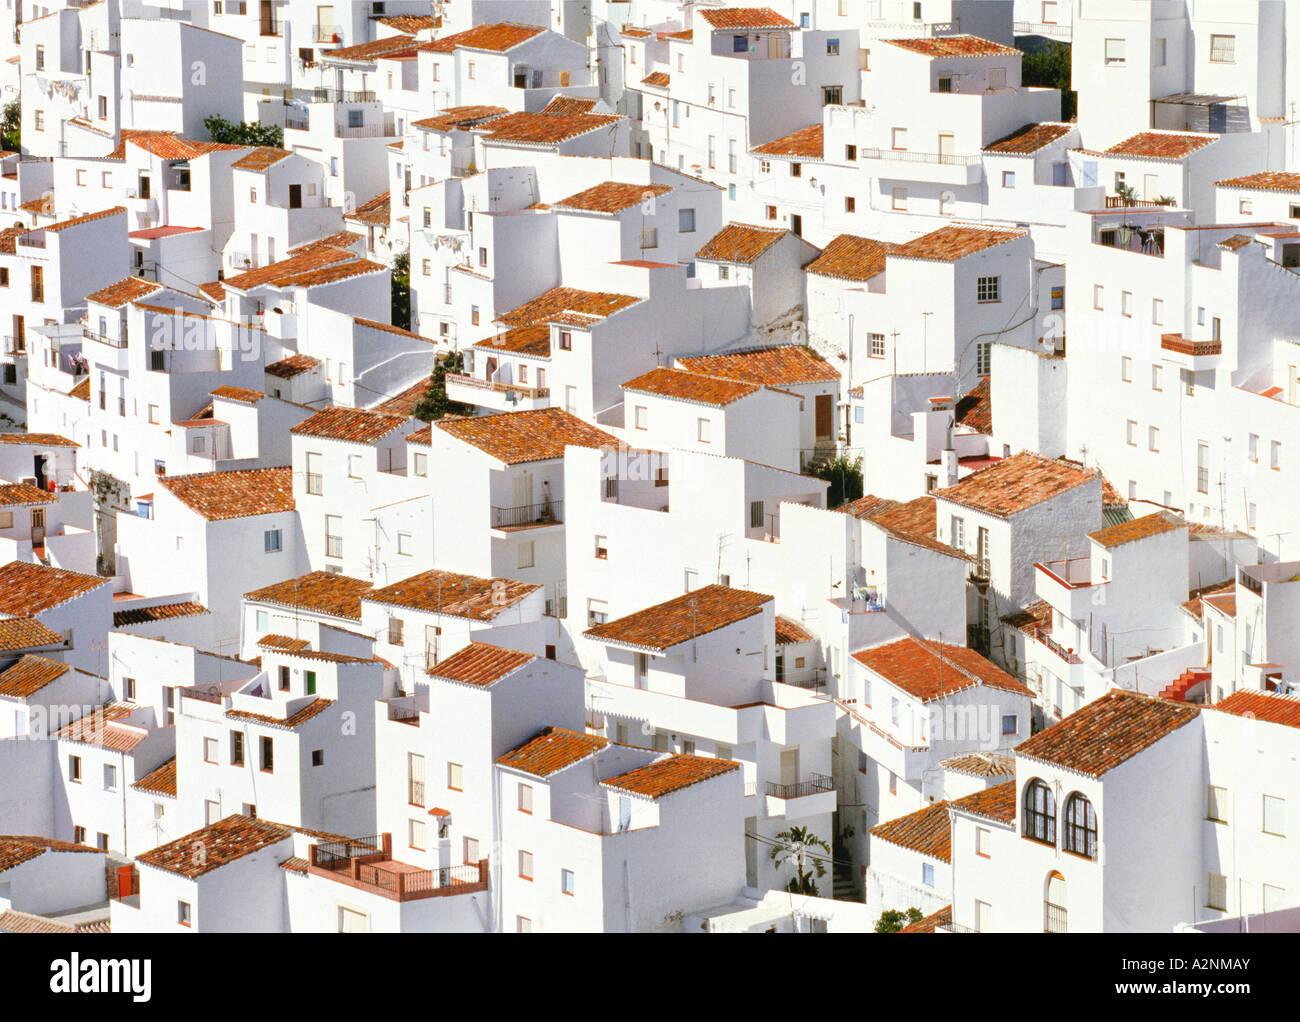 Buildings in town casares malaga province andalusia - El mundo andalucia malaga ...